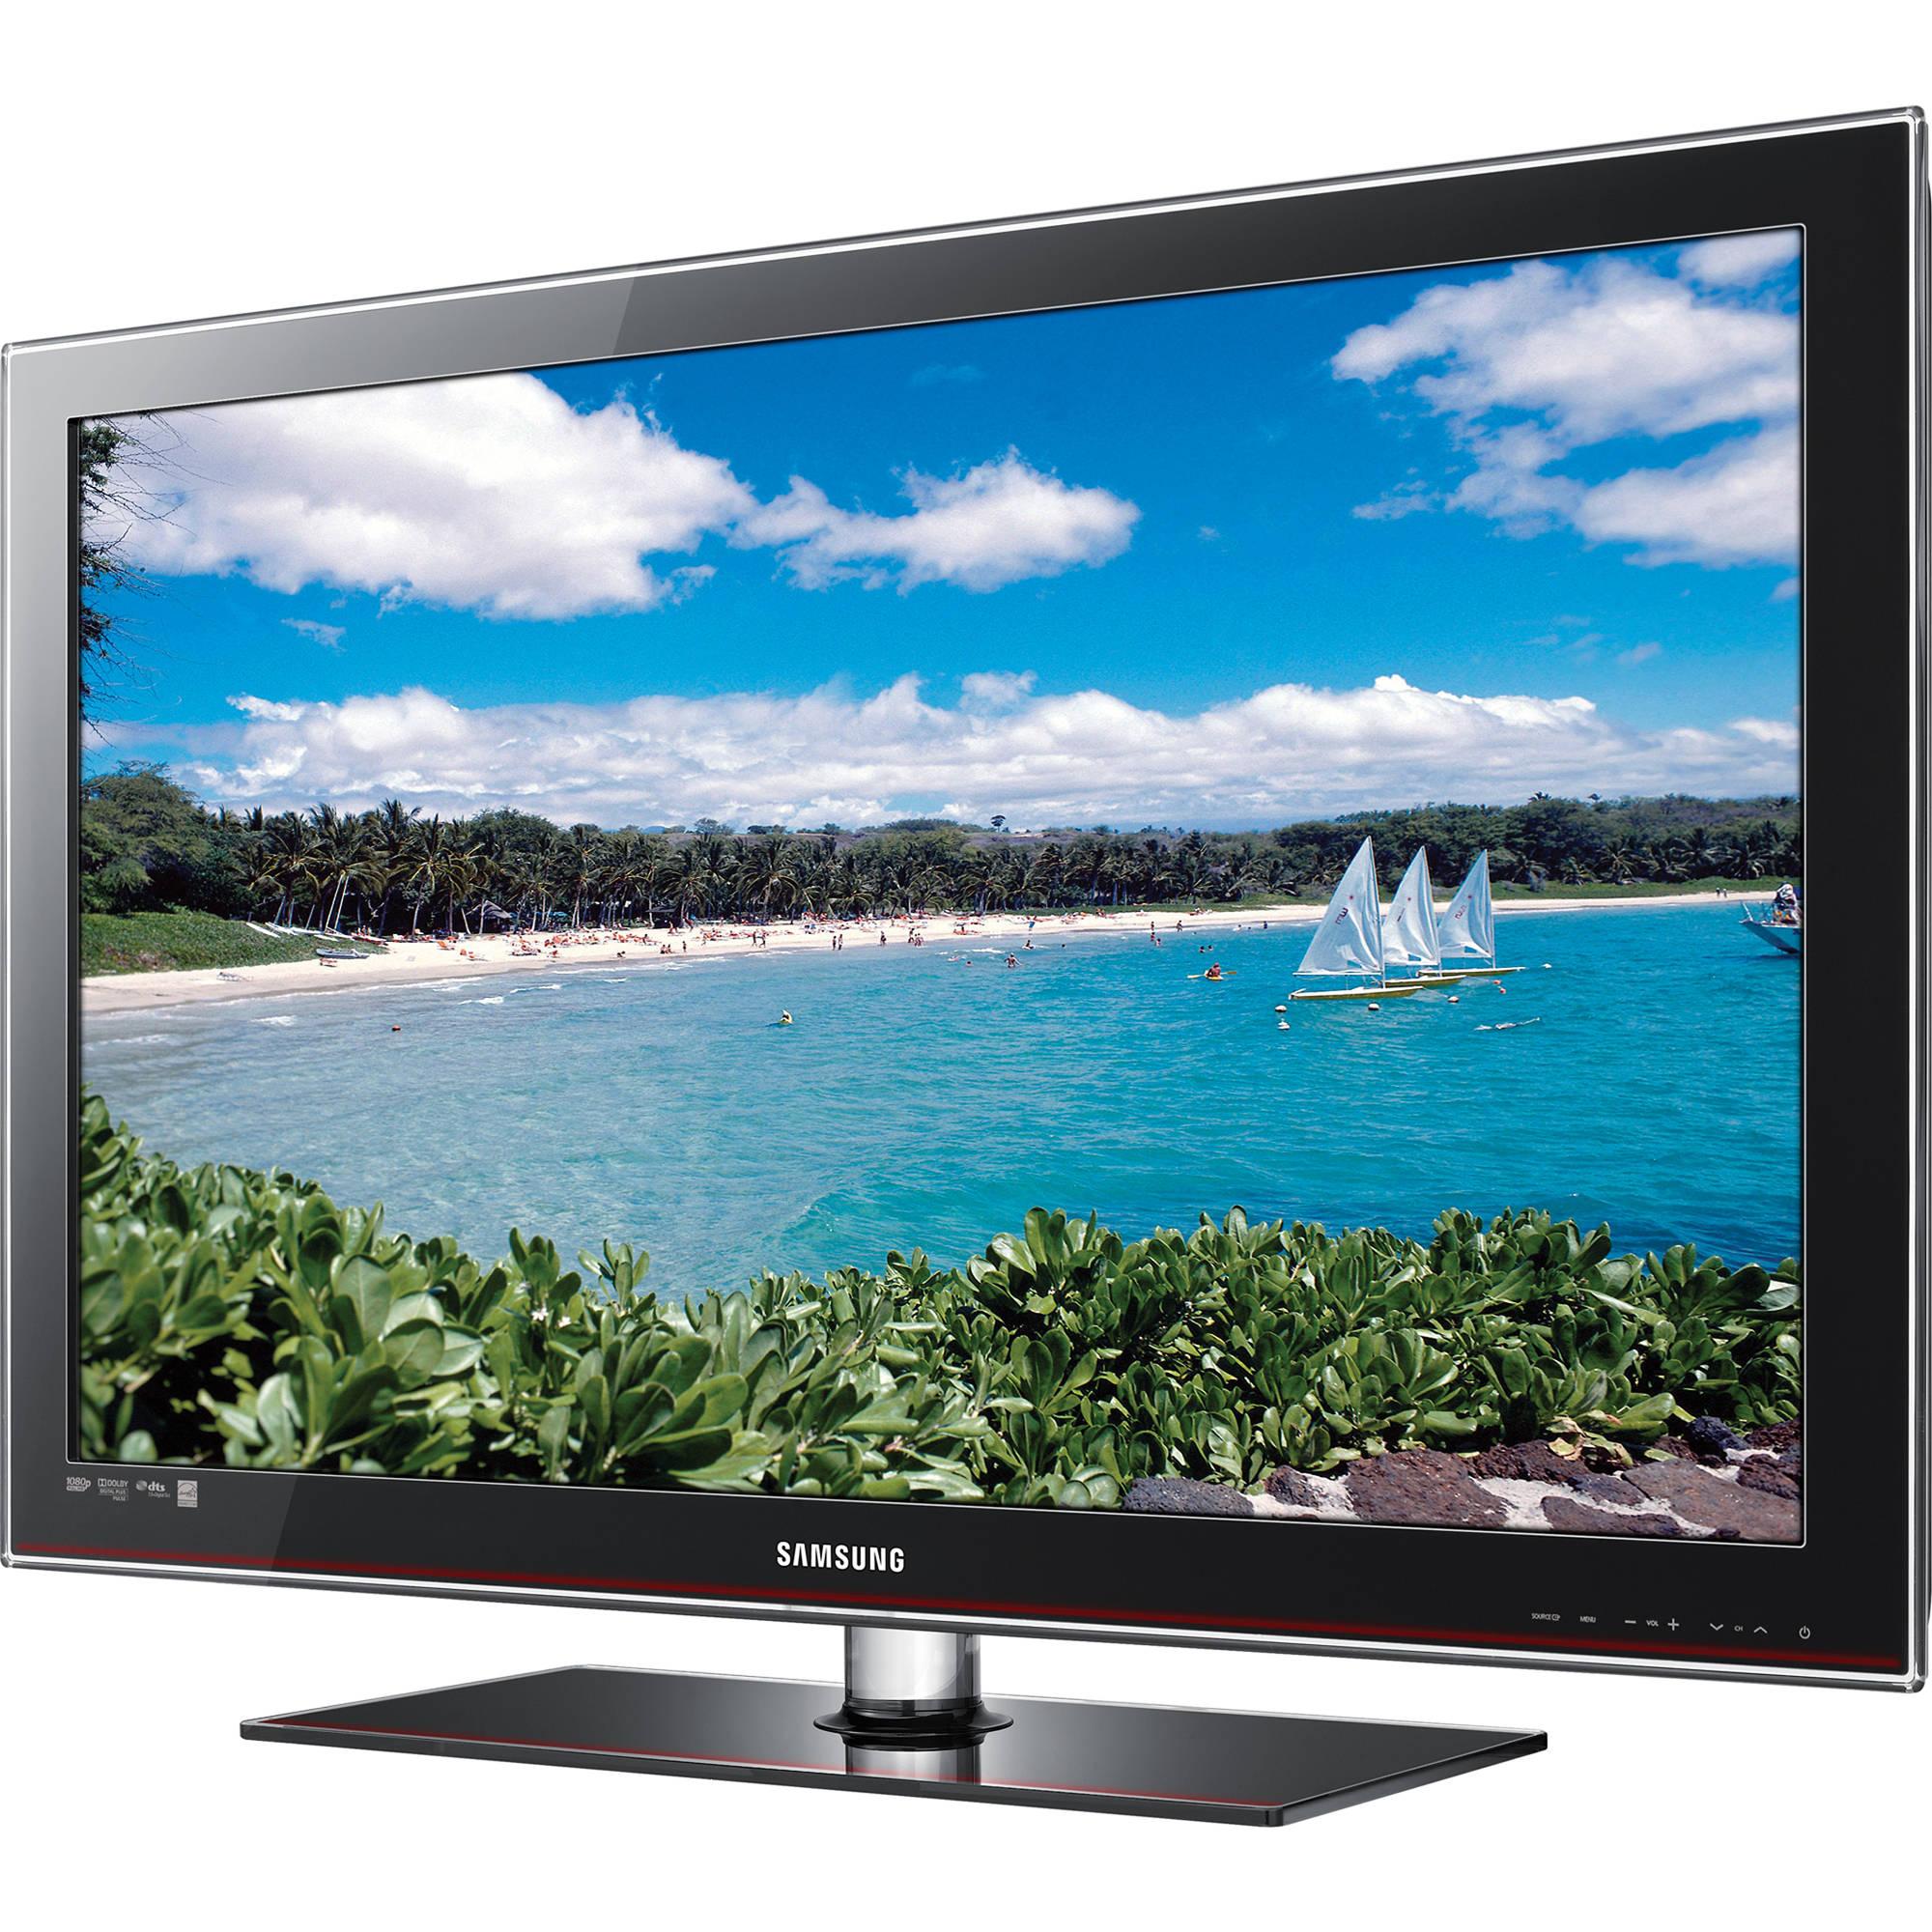 Samsung Ln46c550 46 1080p Lcd Hdtv Ln46c550j1fxza Bh Circuit Board For Tv